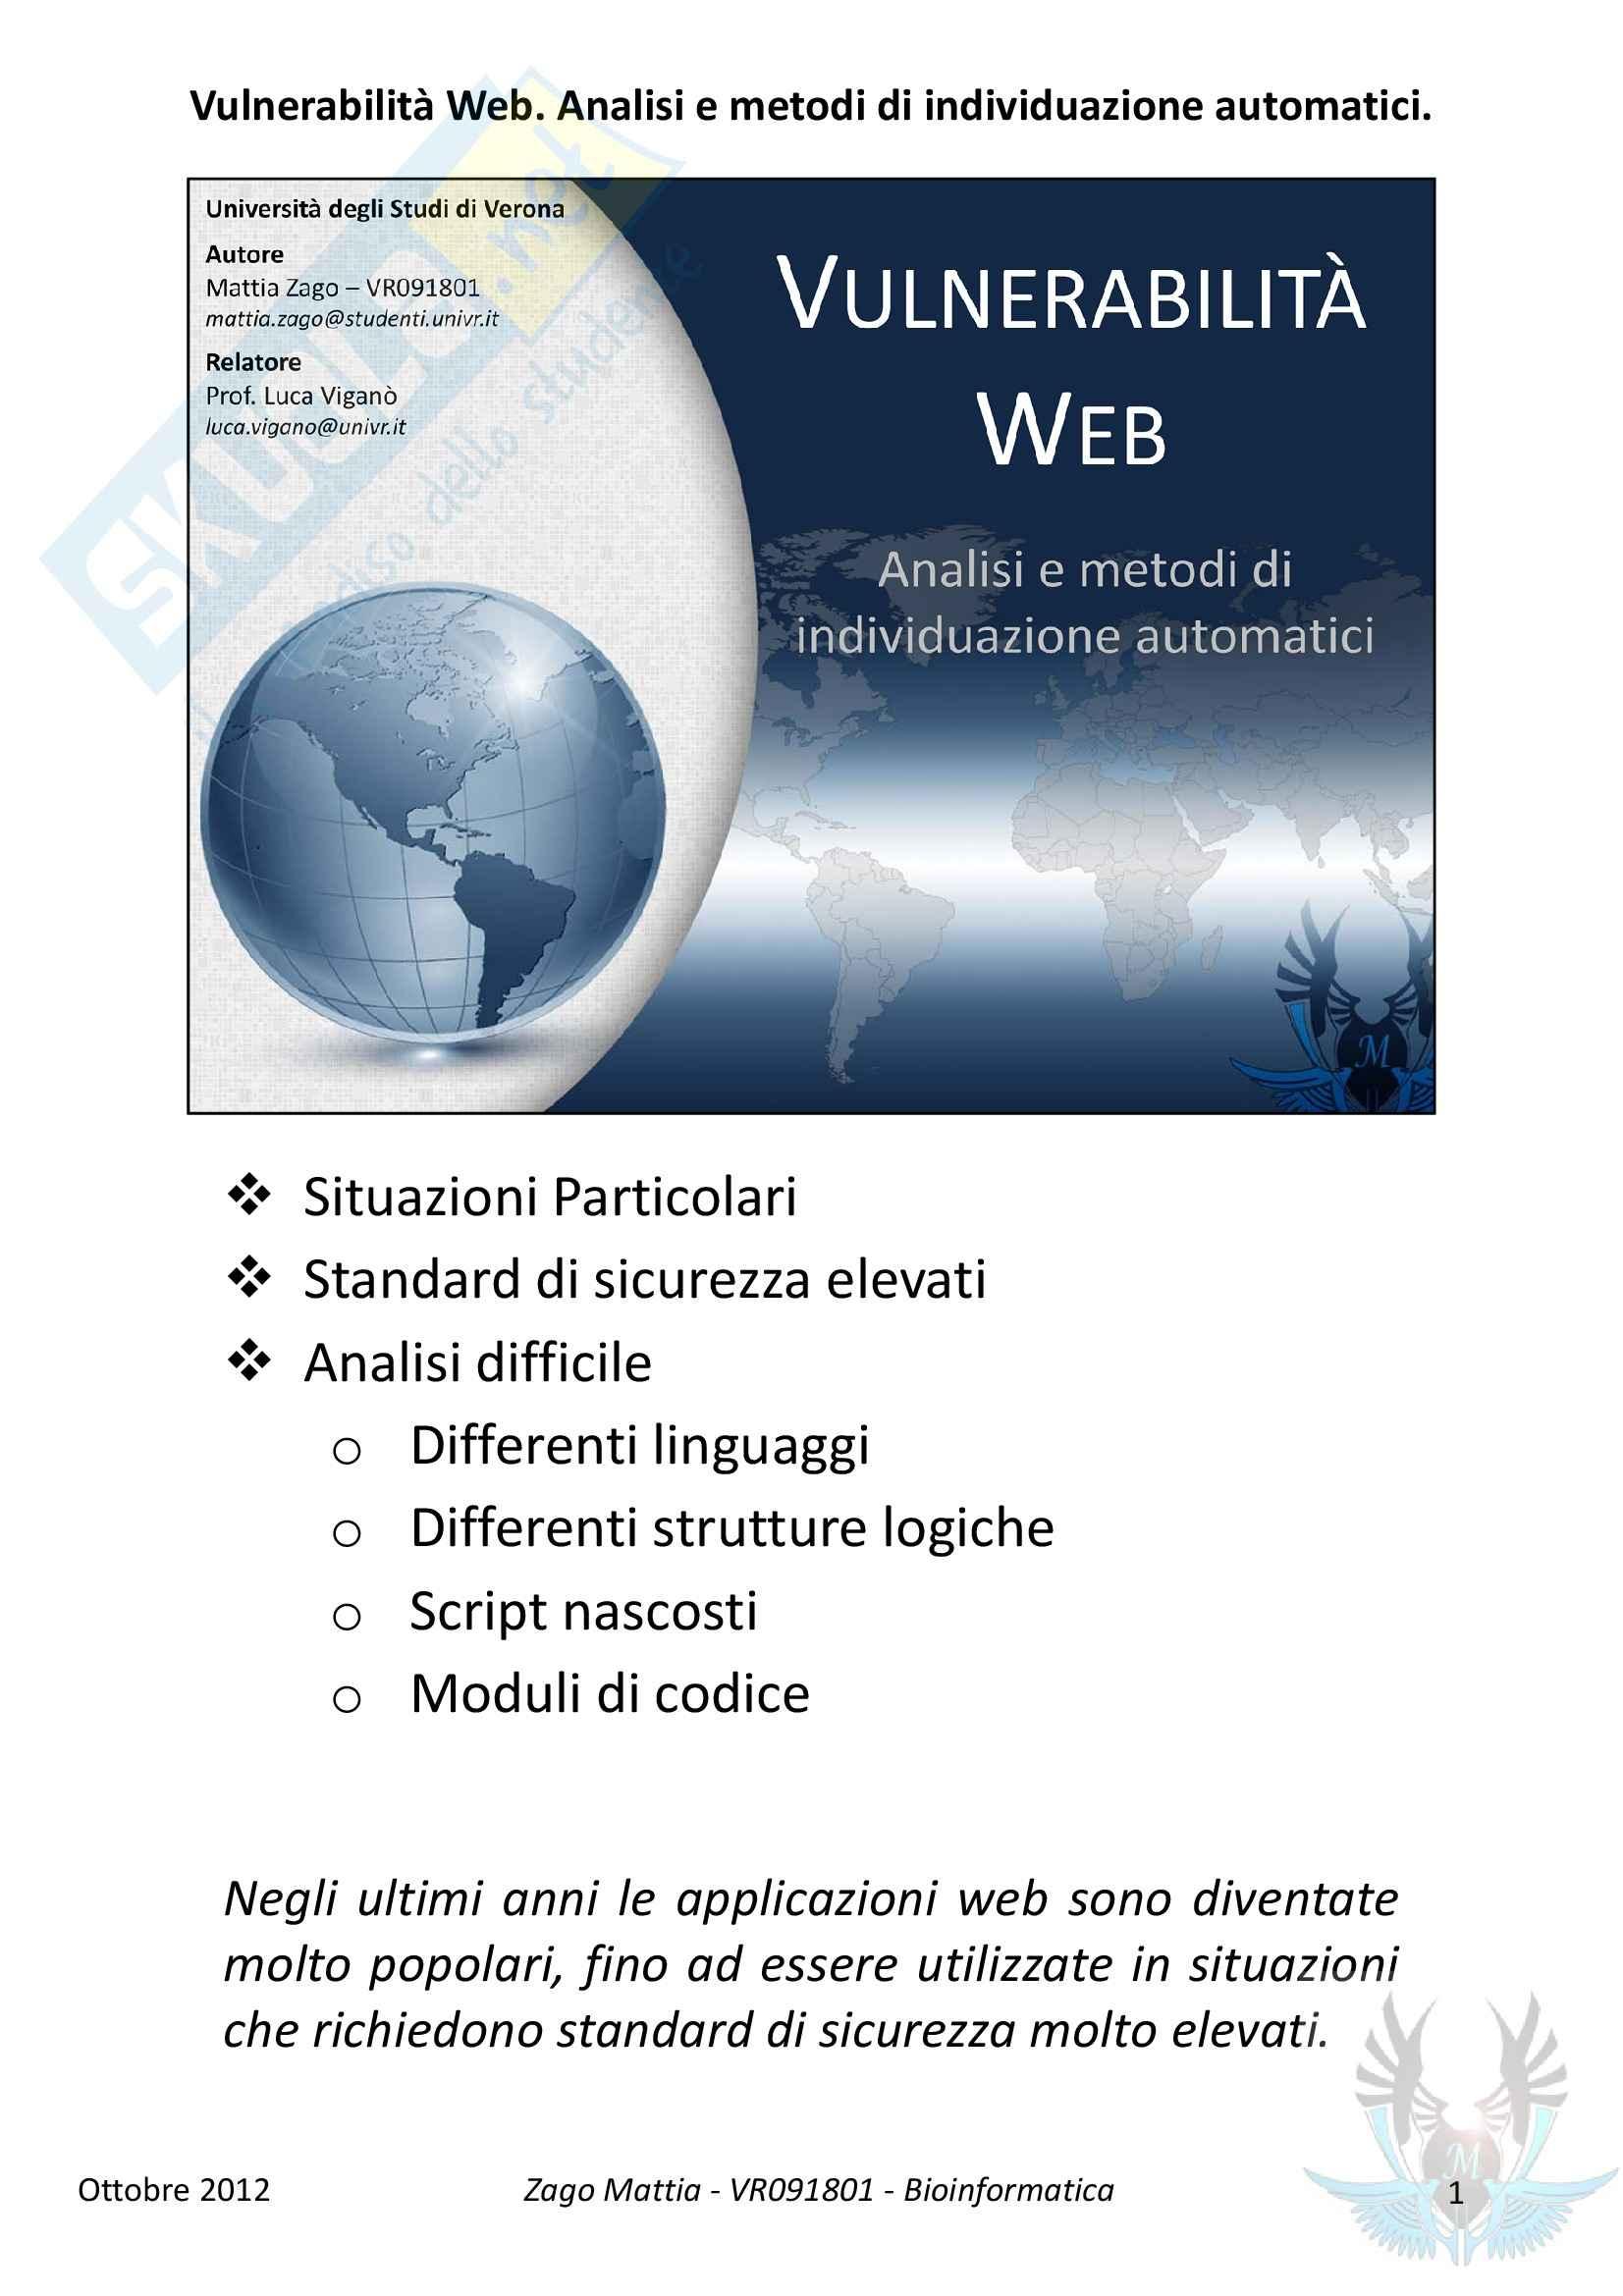 Vulnerabilità Web: Analisi e Metodi di Individuzione Automatici